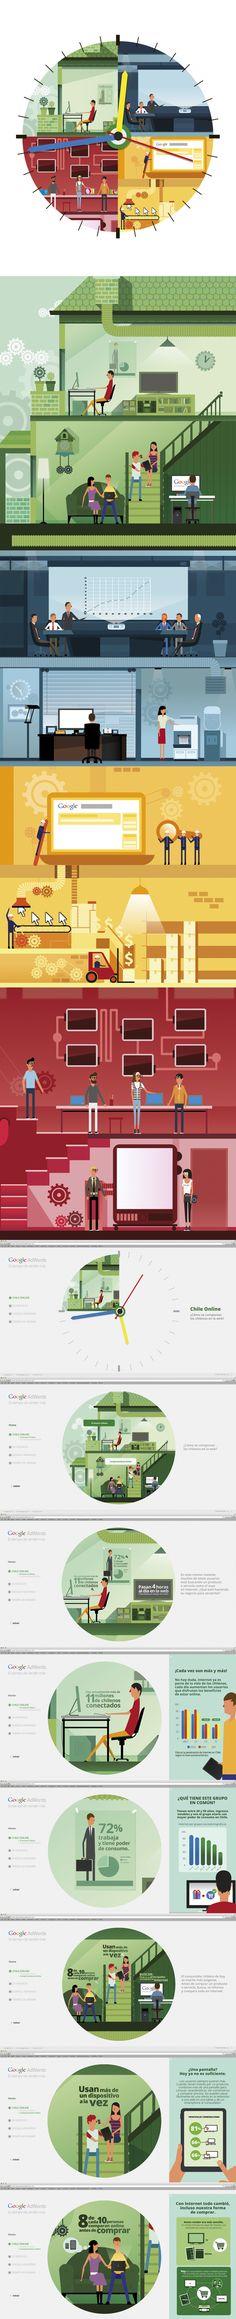 GOOGLE AdWords. on Behance